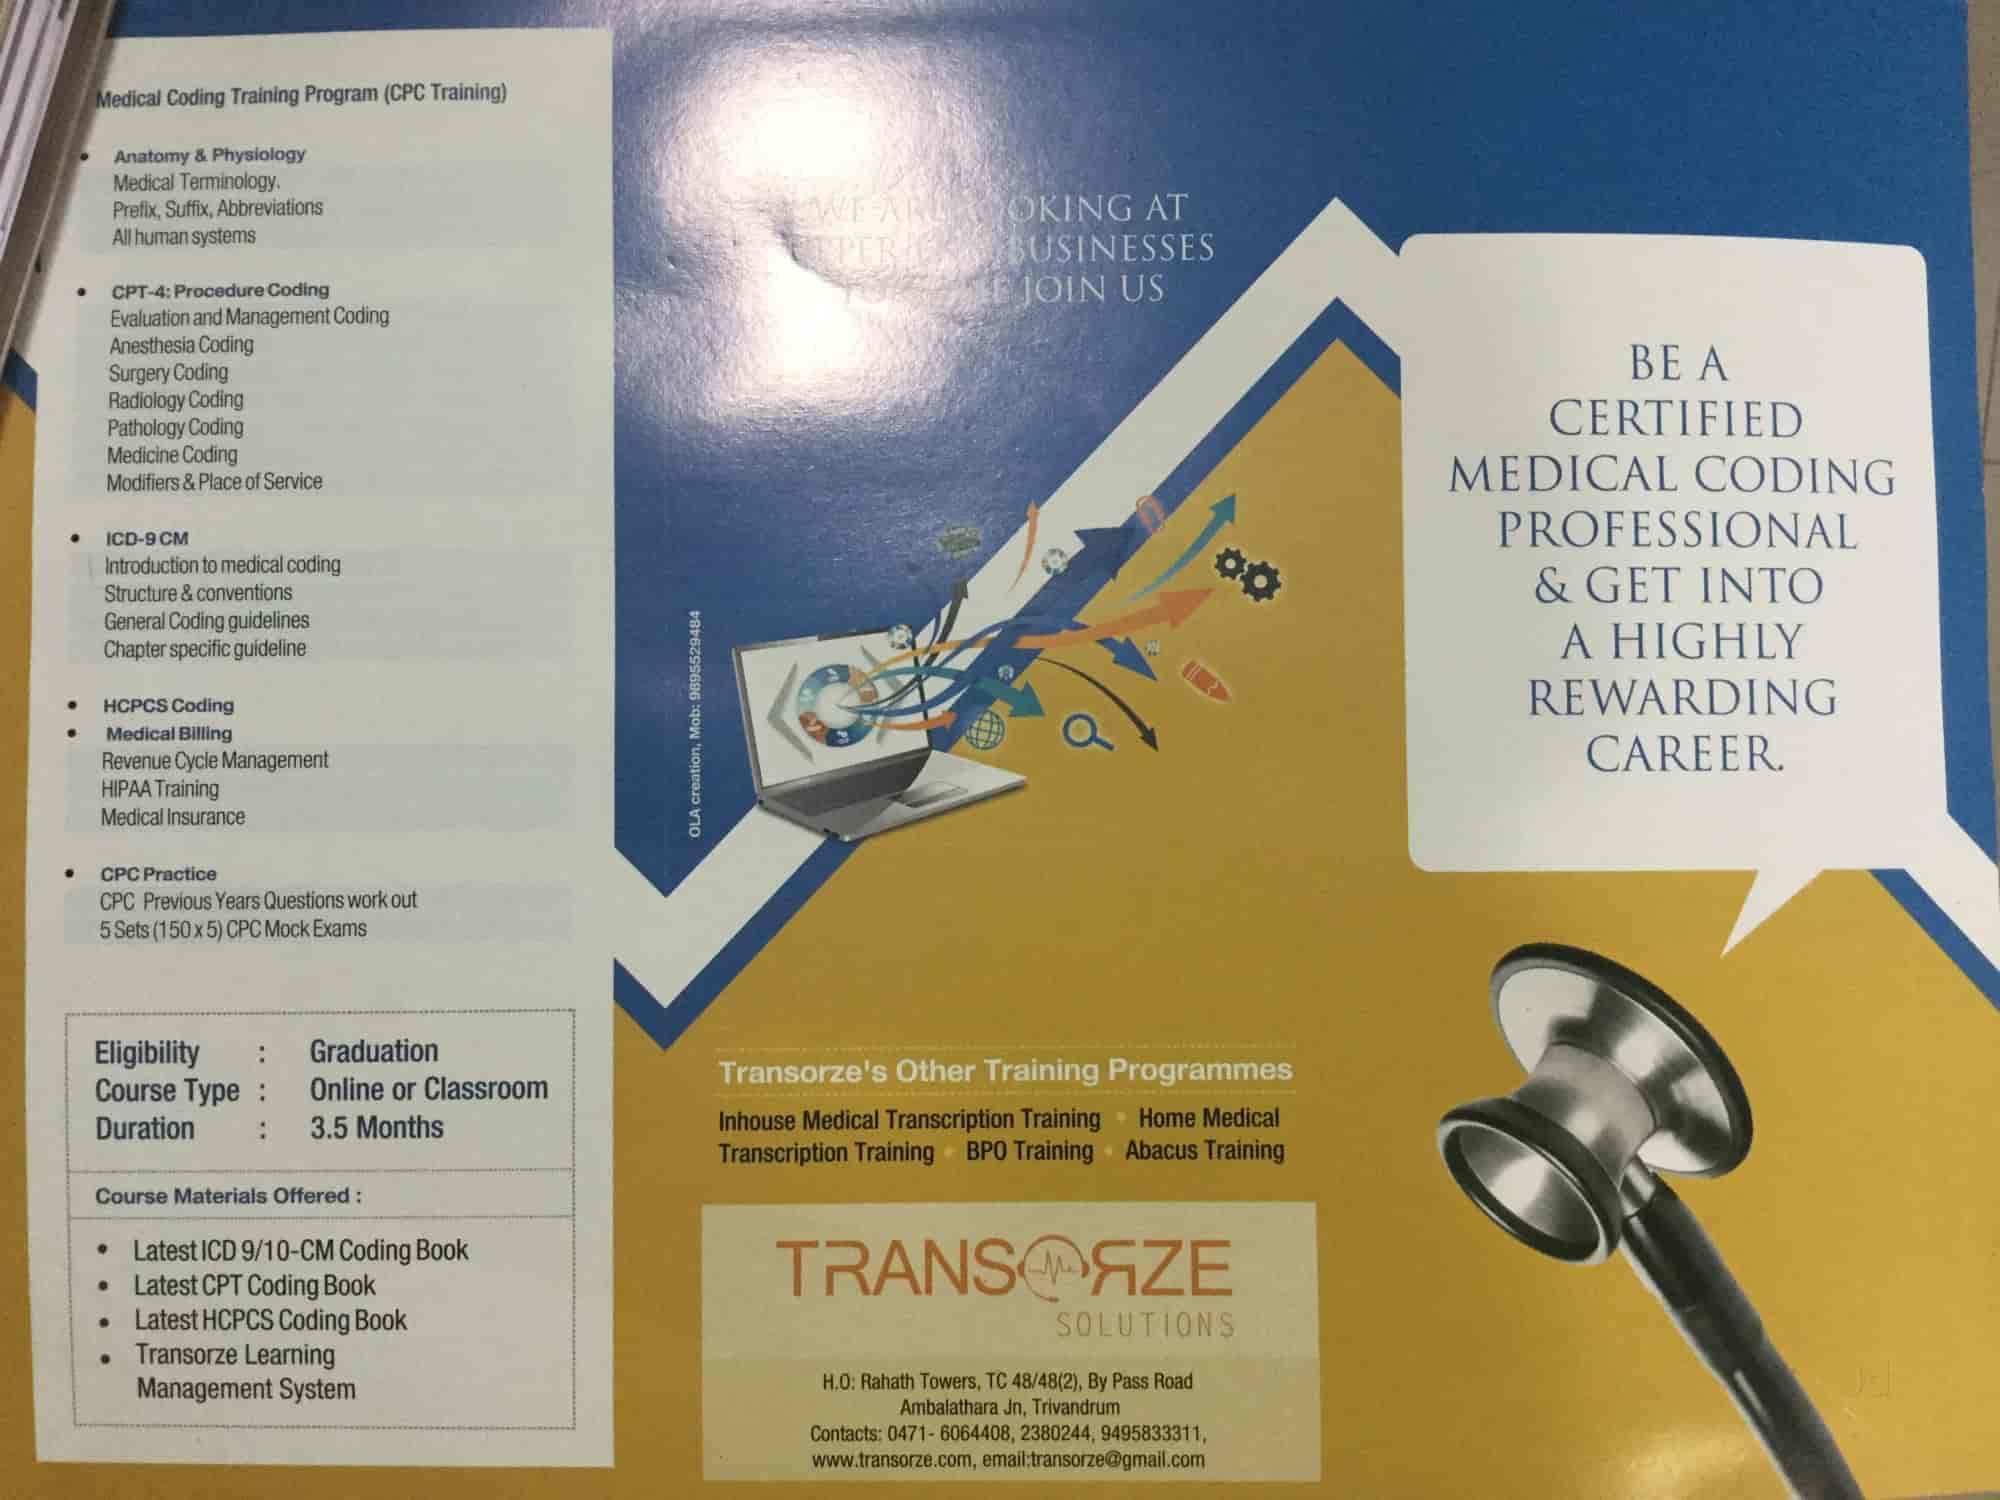 Asombroso Official Cpc Certification Study Guide Embellecimiento ...